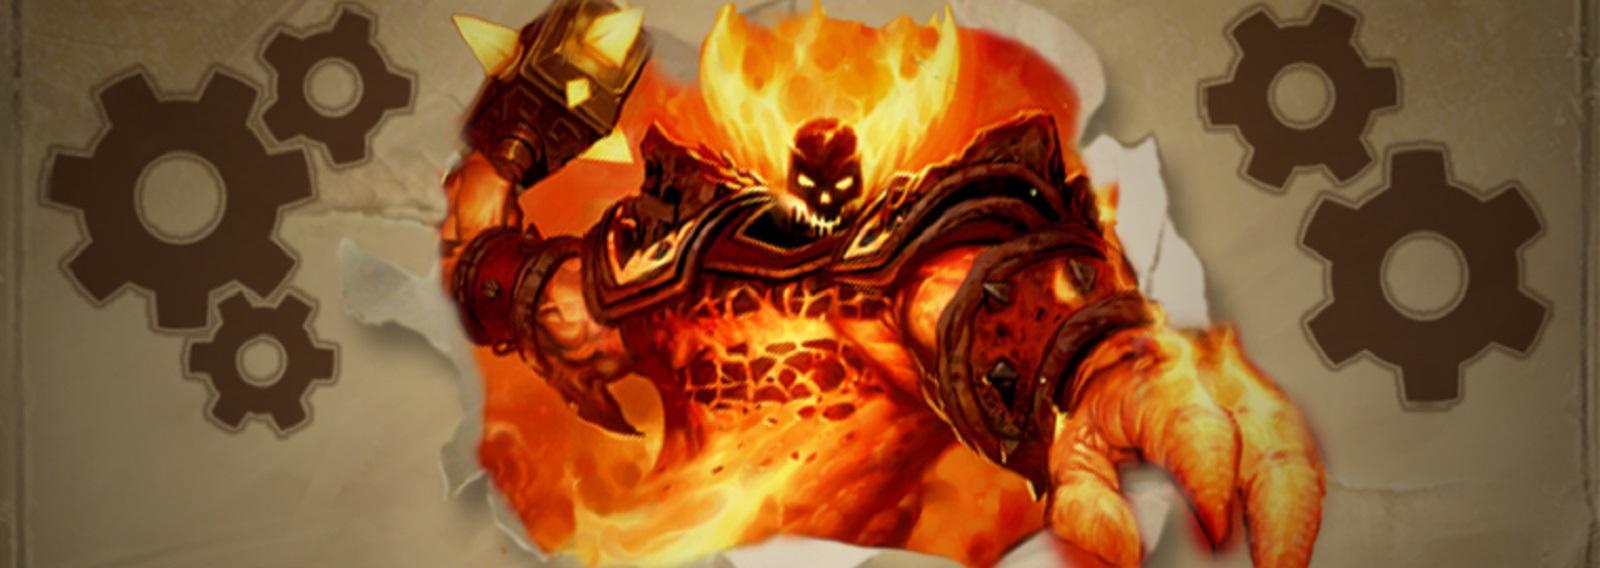 Hearthstone's Battlegrounds meta just got a huge shakeup with some hero and card nerfs screenshot